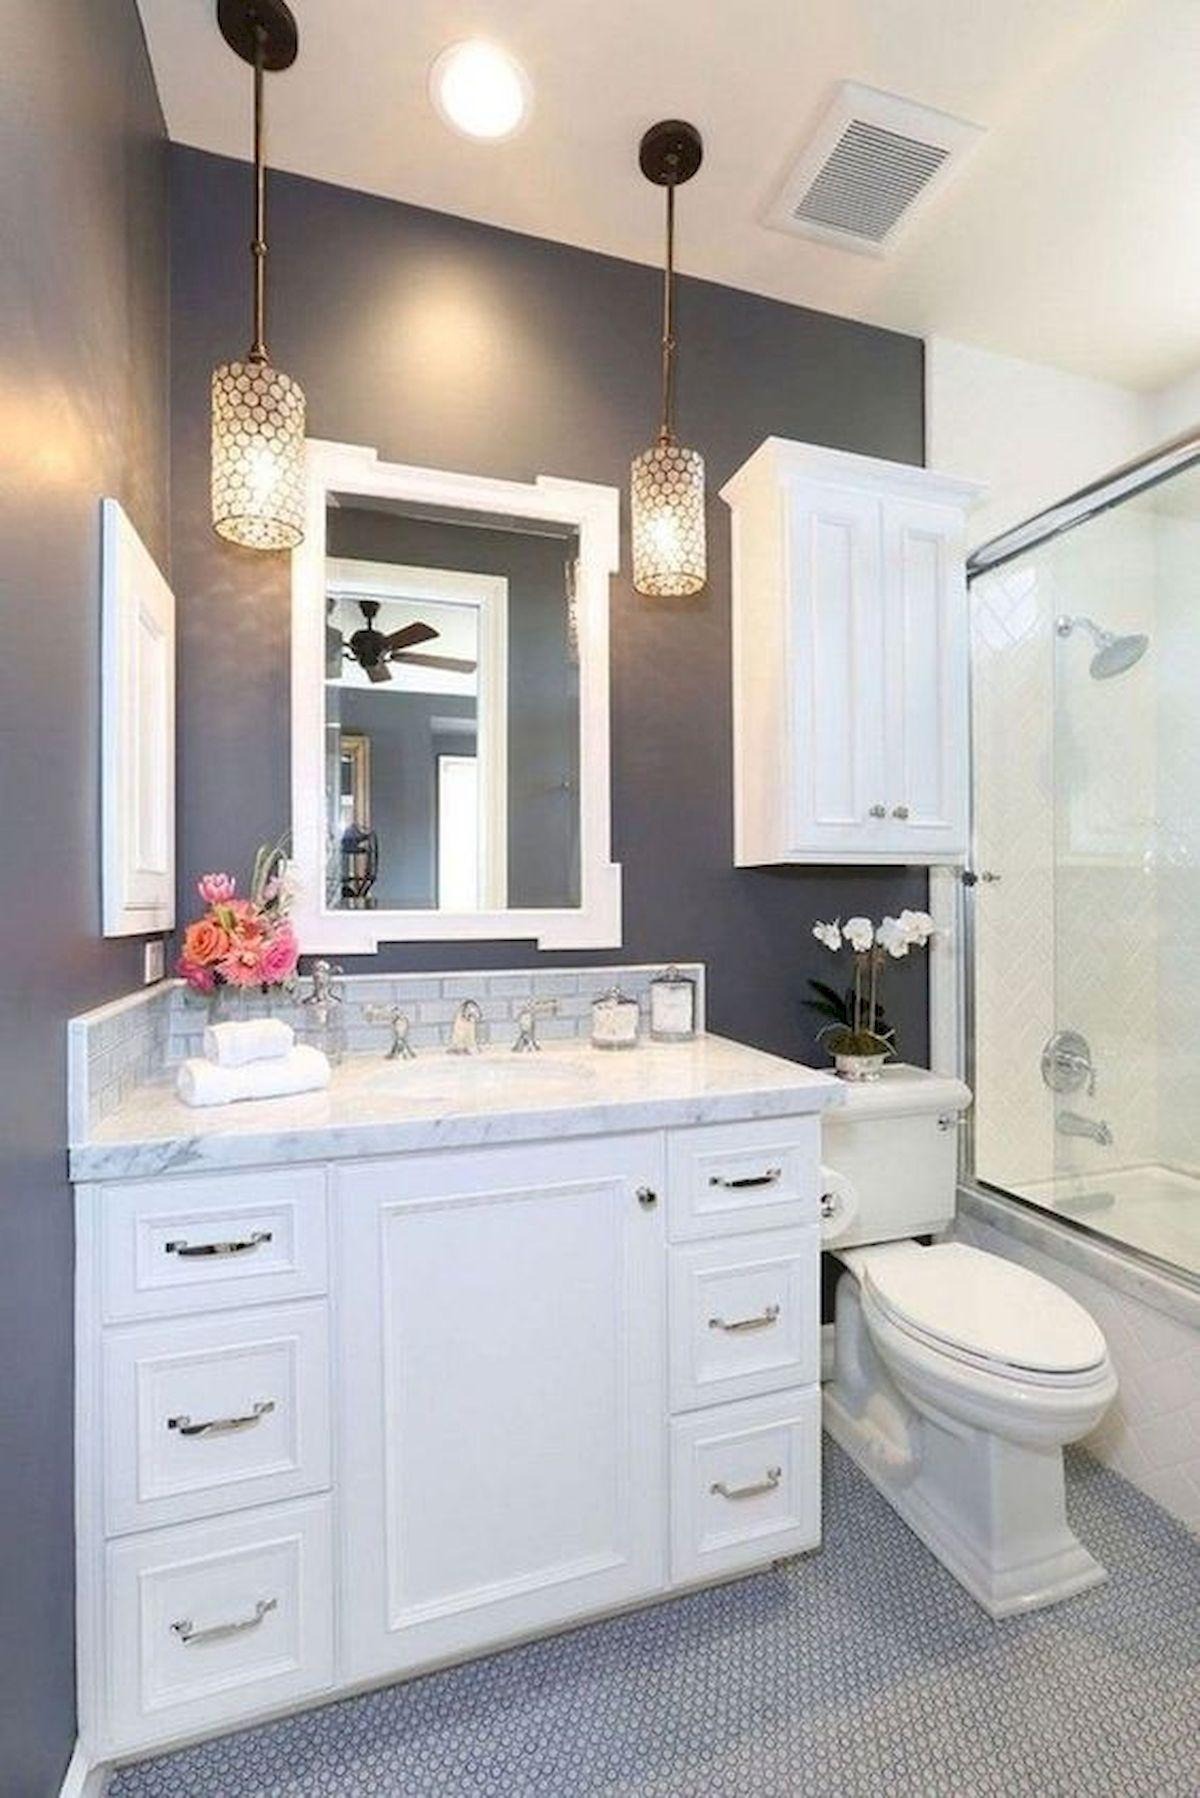 50 Brilliant Storage Design Ideas For Small Bathroom To Make It Look Spacious (4)